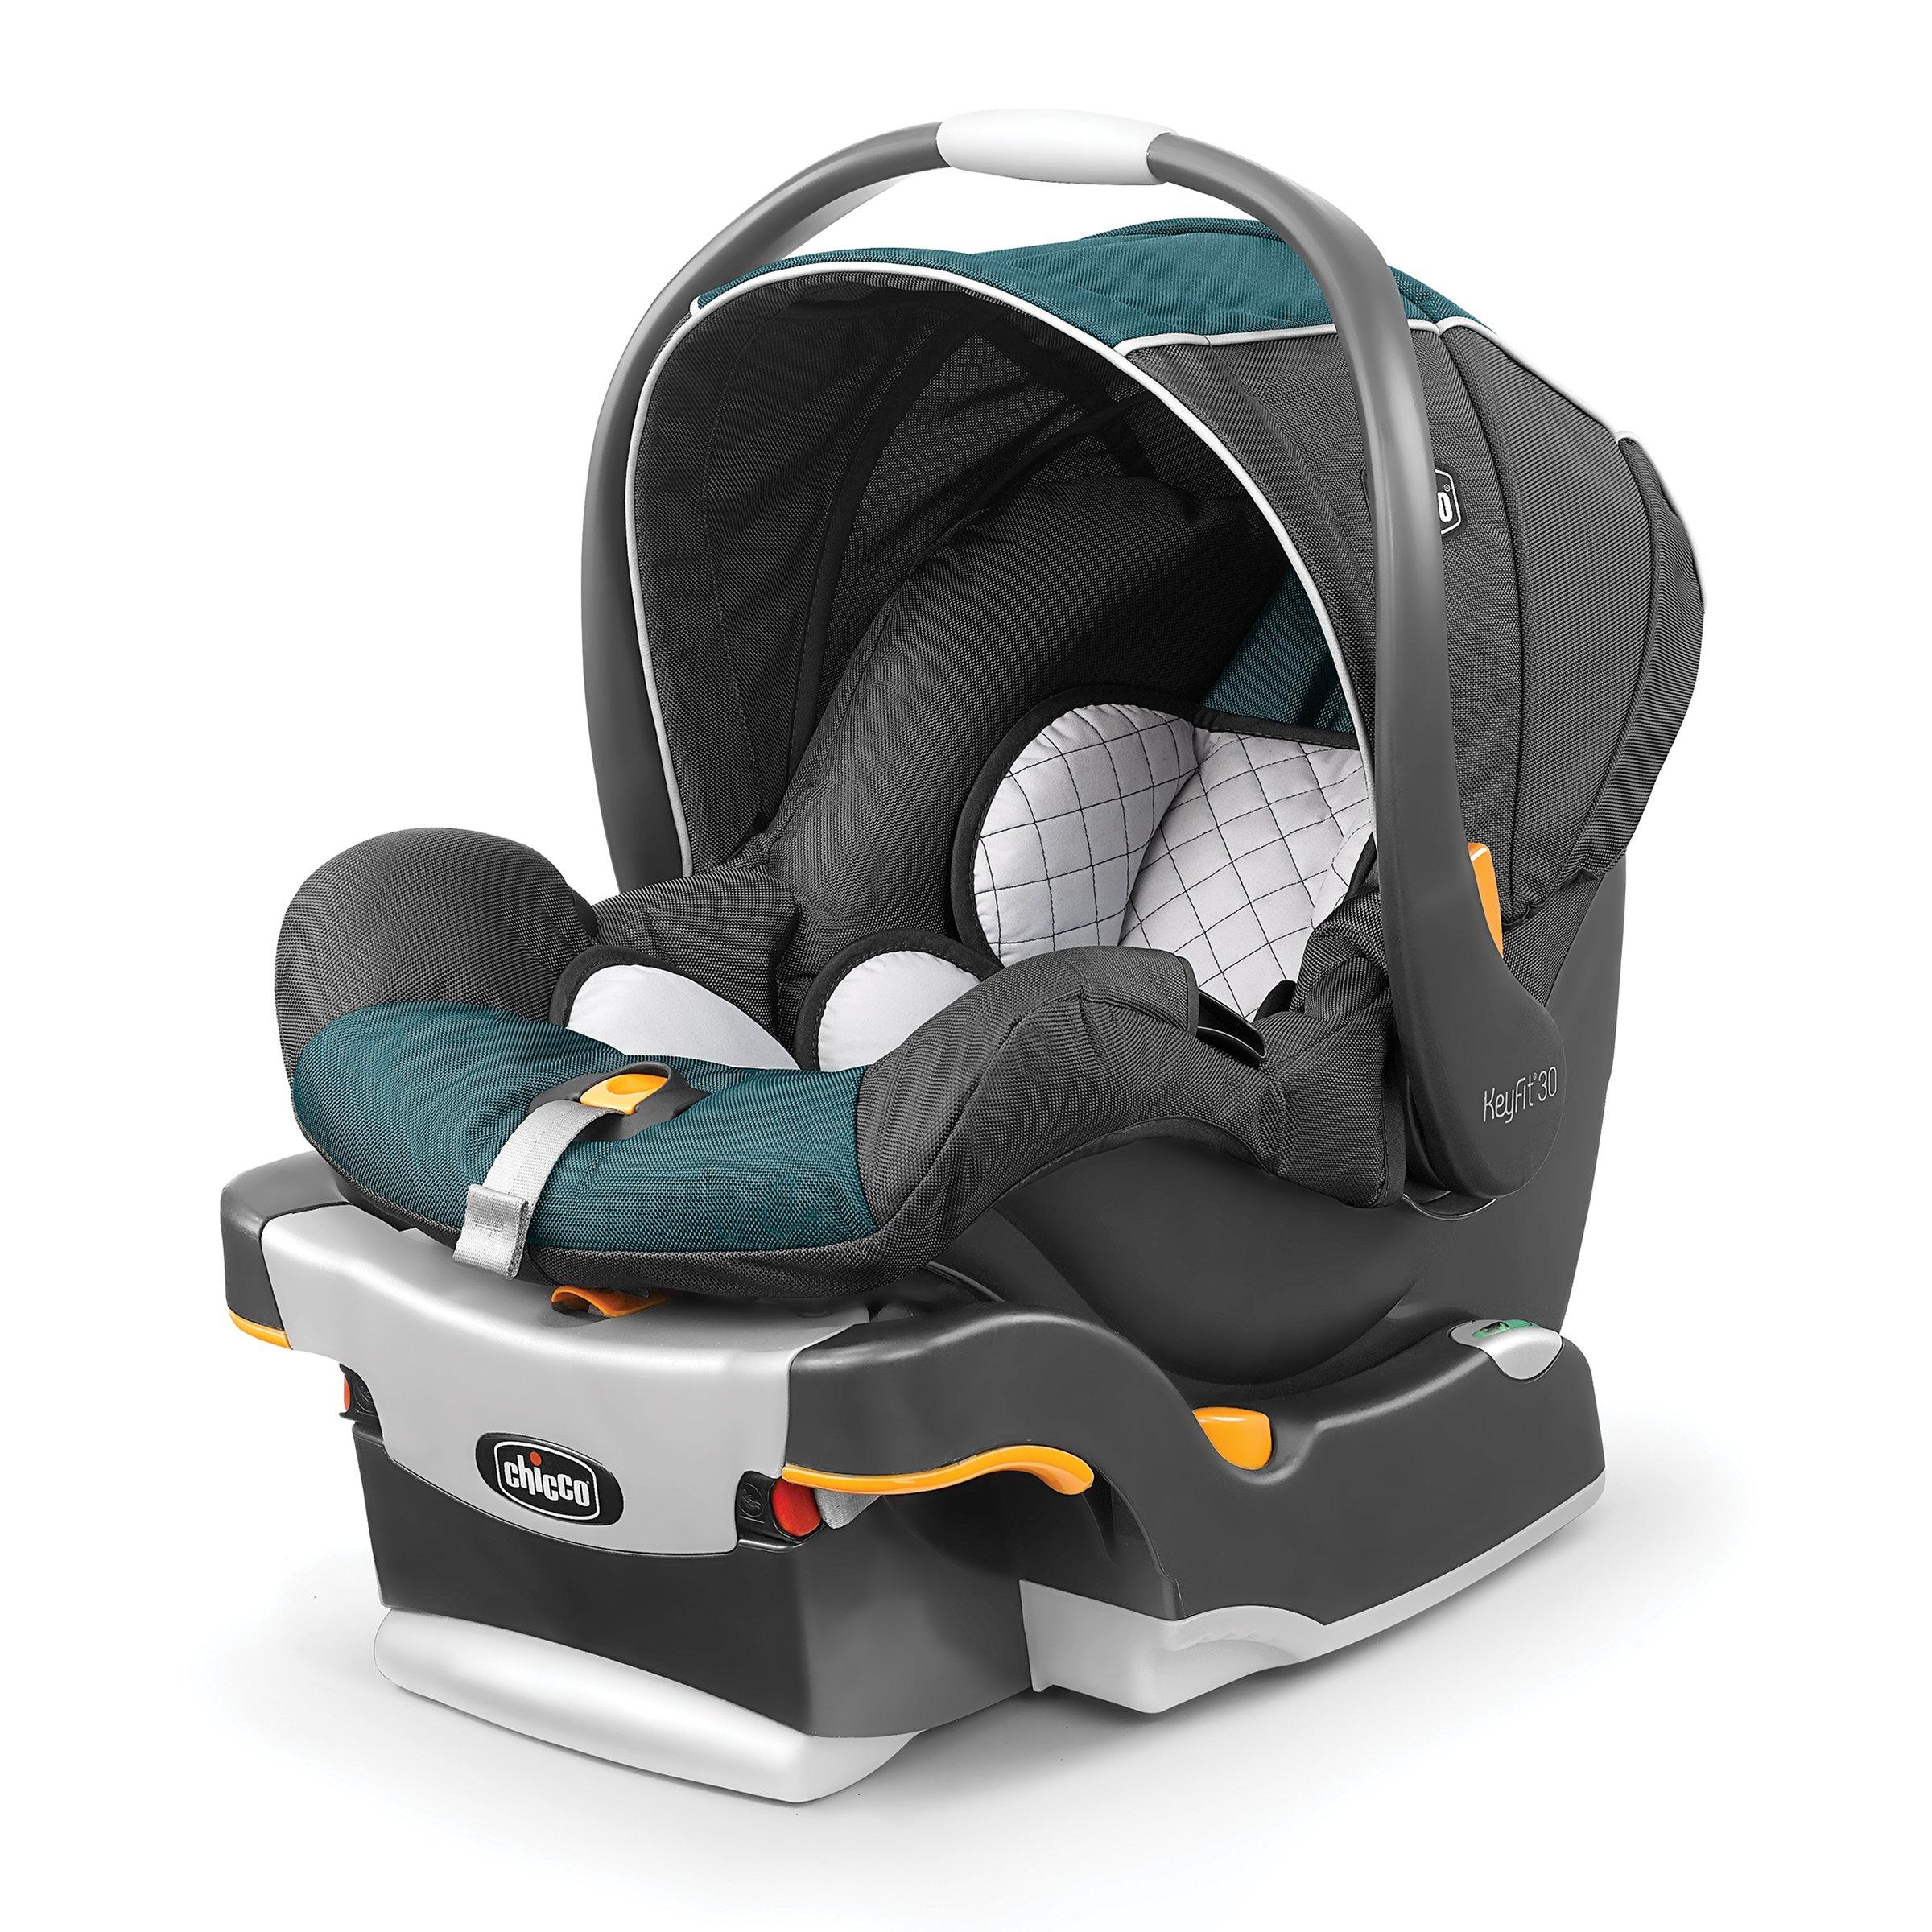 Amazon.com : Chicco KeyFit Caddy Frame Stroller : Lightweight ...